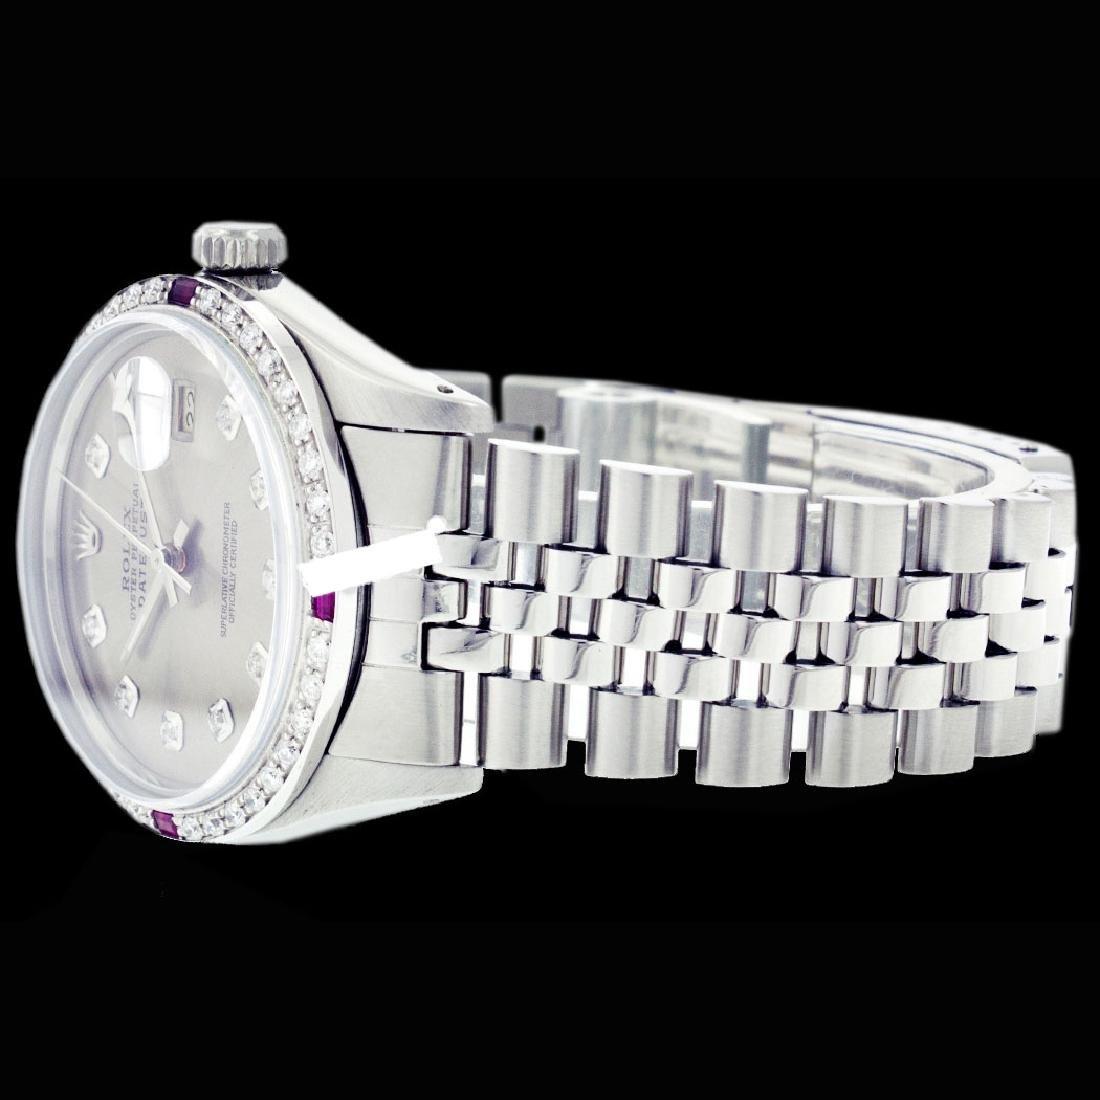 Rolex Men's Stainless Steel, QuickSet, Diam Dial & - 4